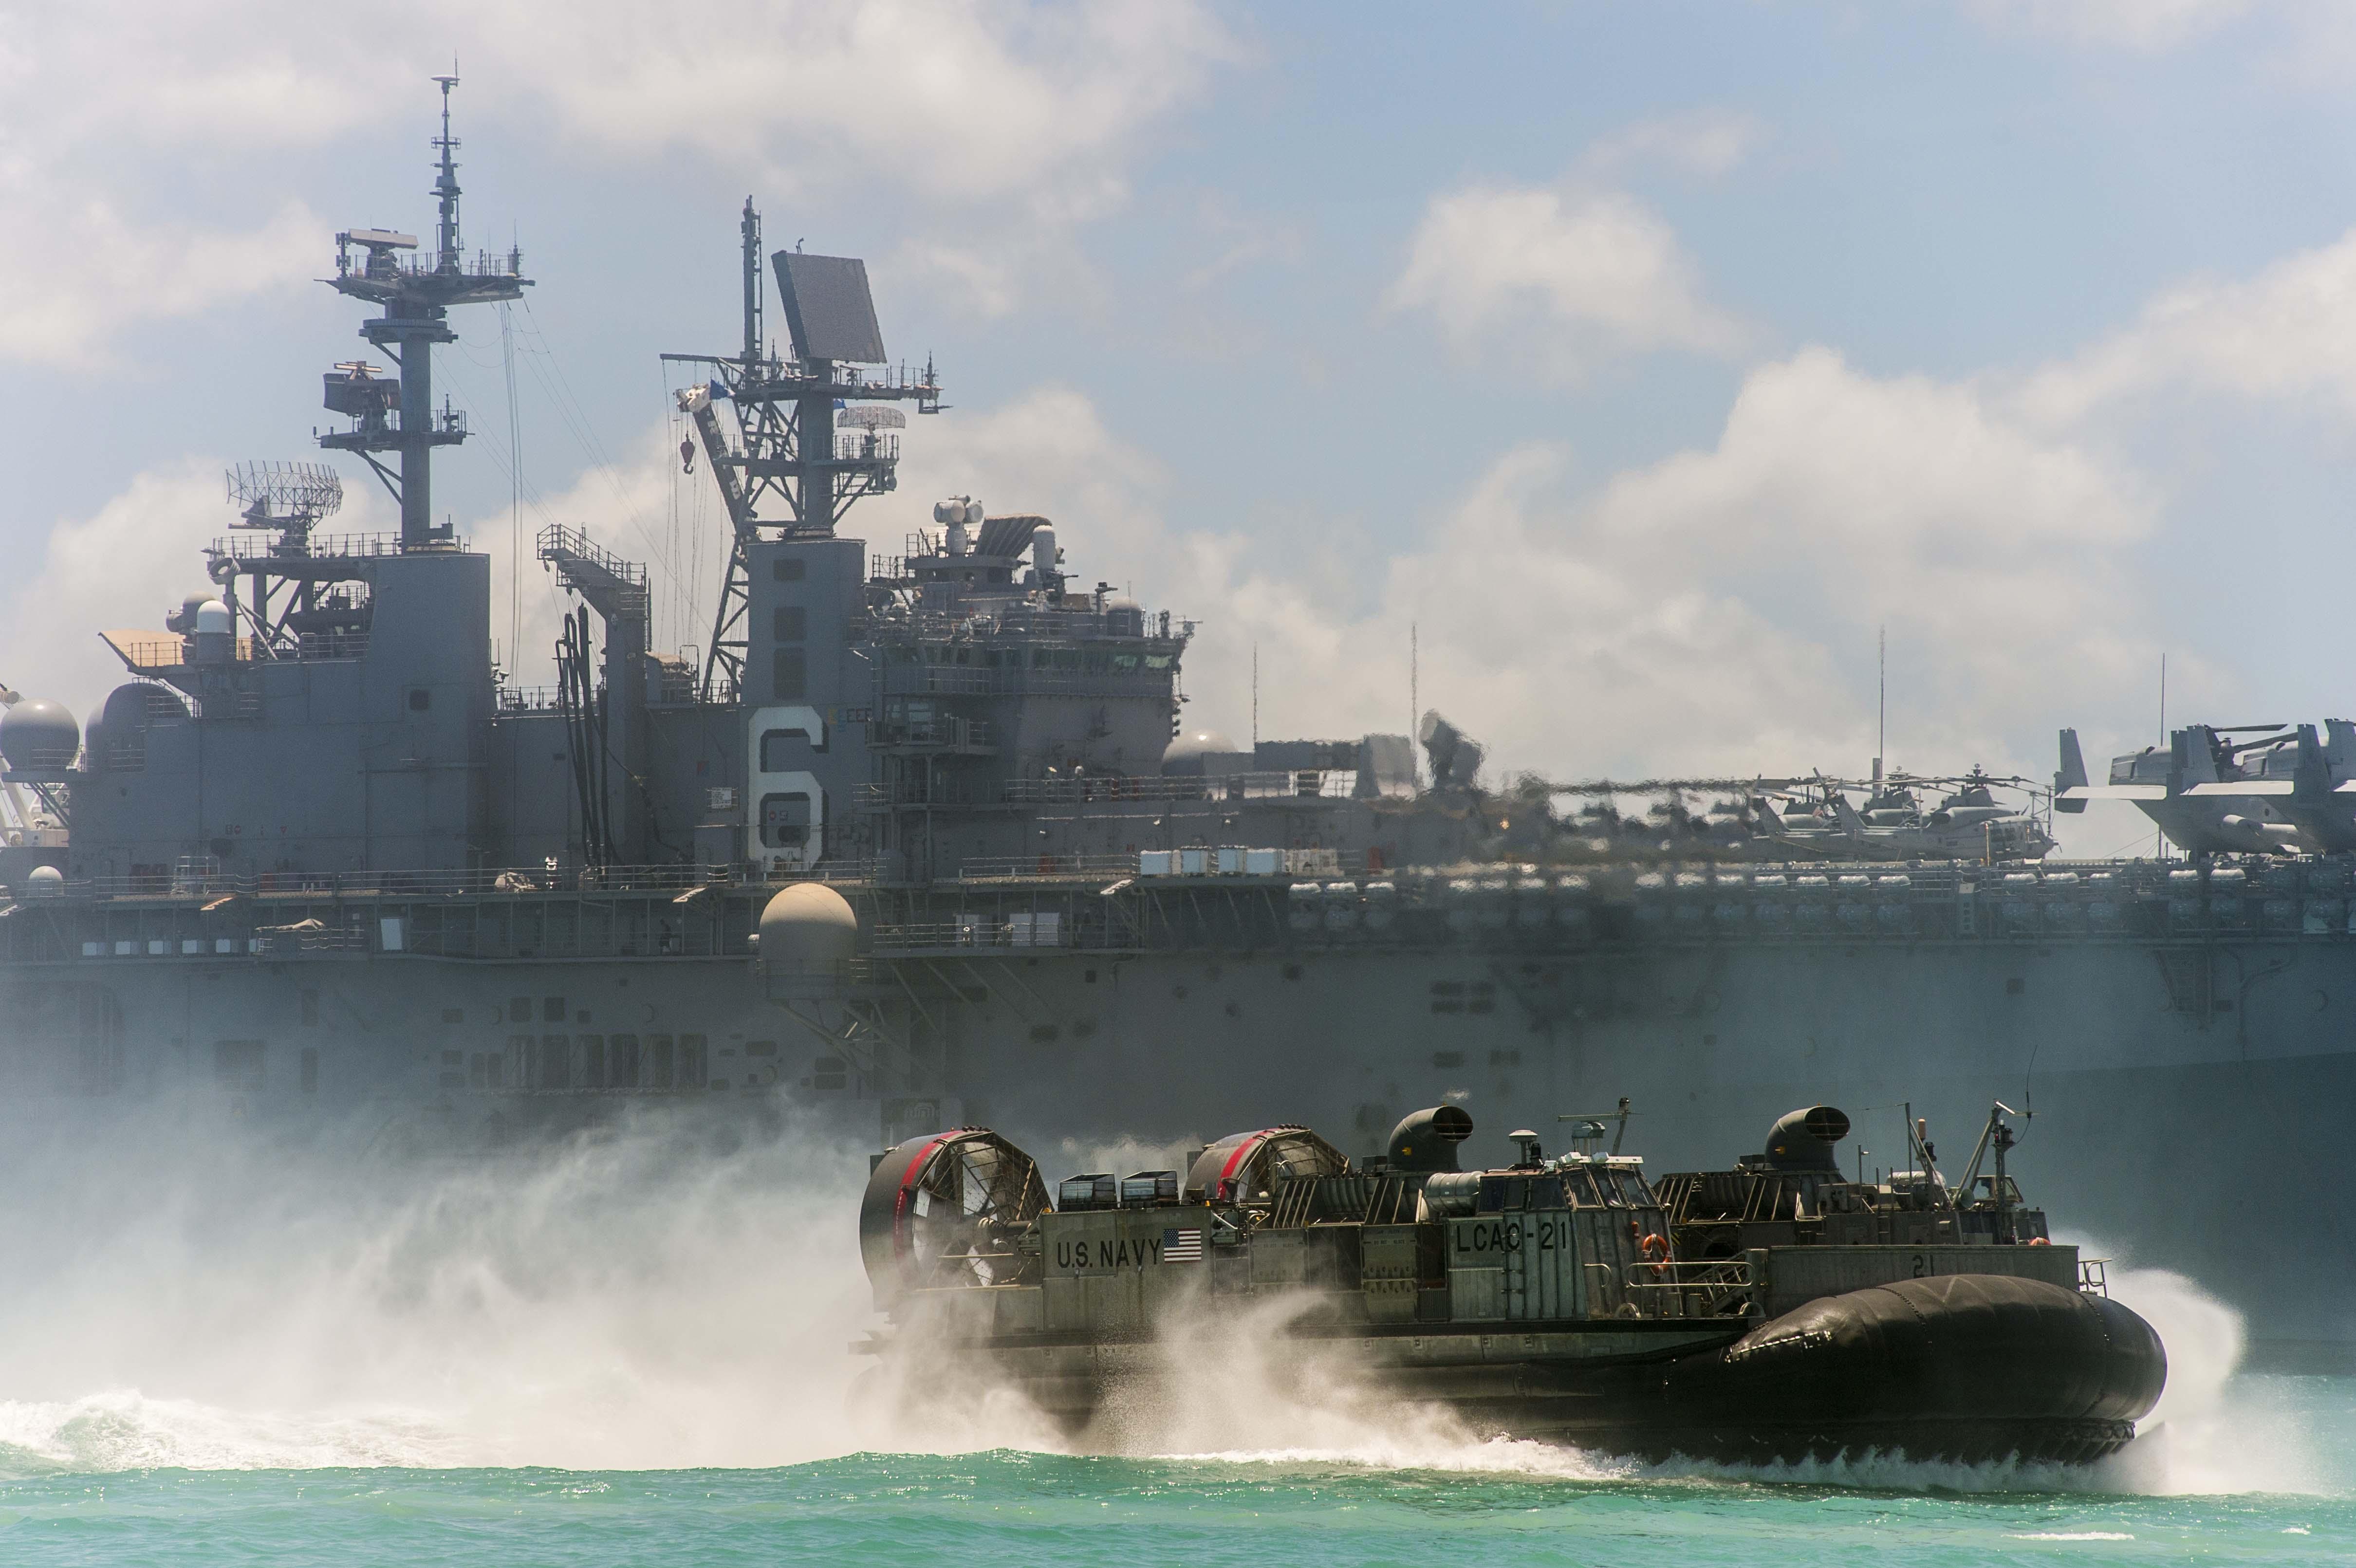 Landing,Craft,Air,Cushion,LCAC,Hover,Landing,Amphibious,Assault,craft